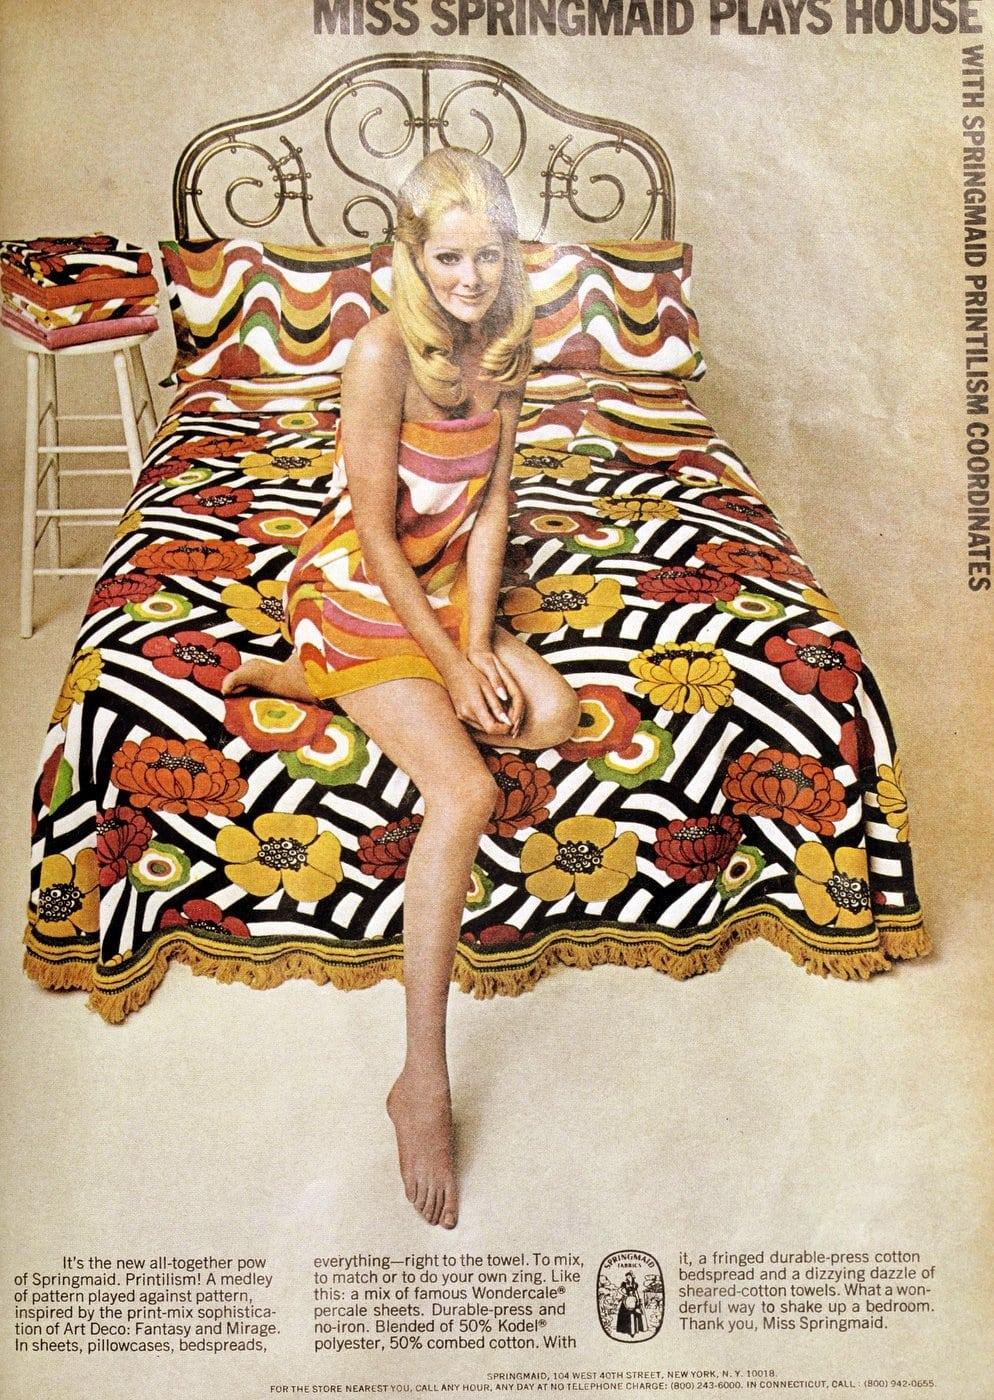 Vintage Springmaid Printilism flowered bedding from 1970